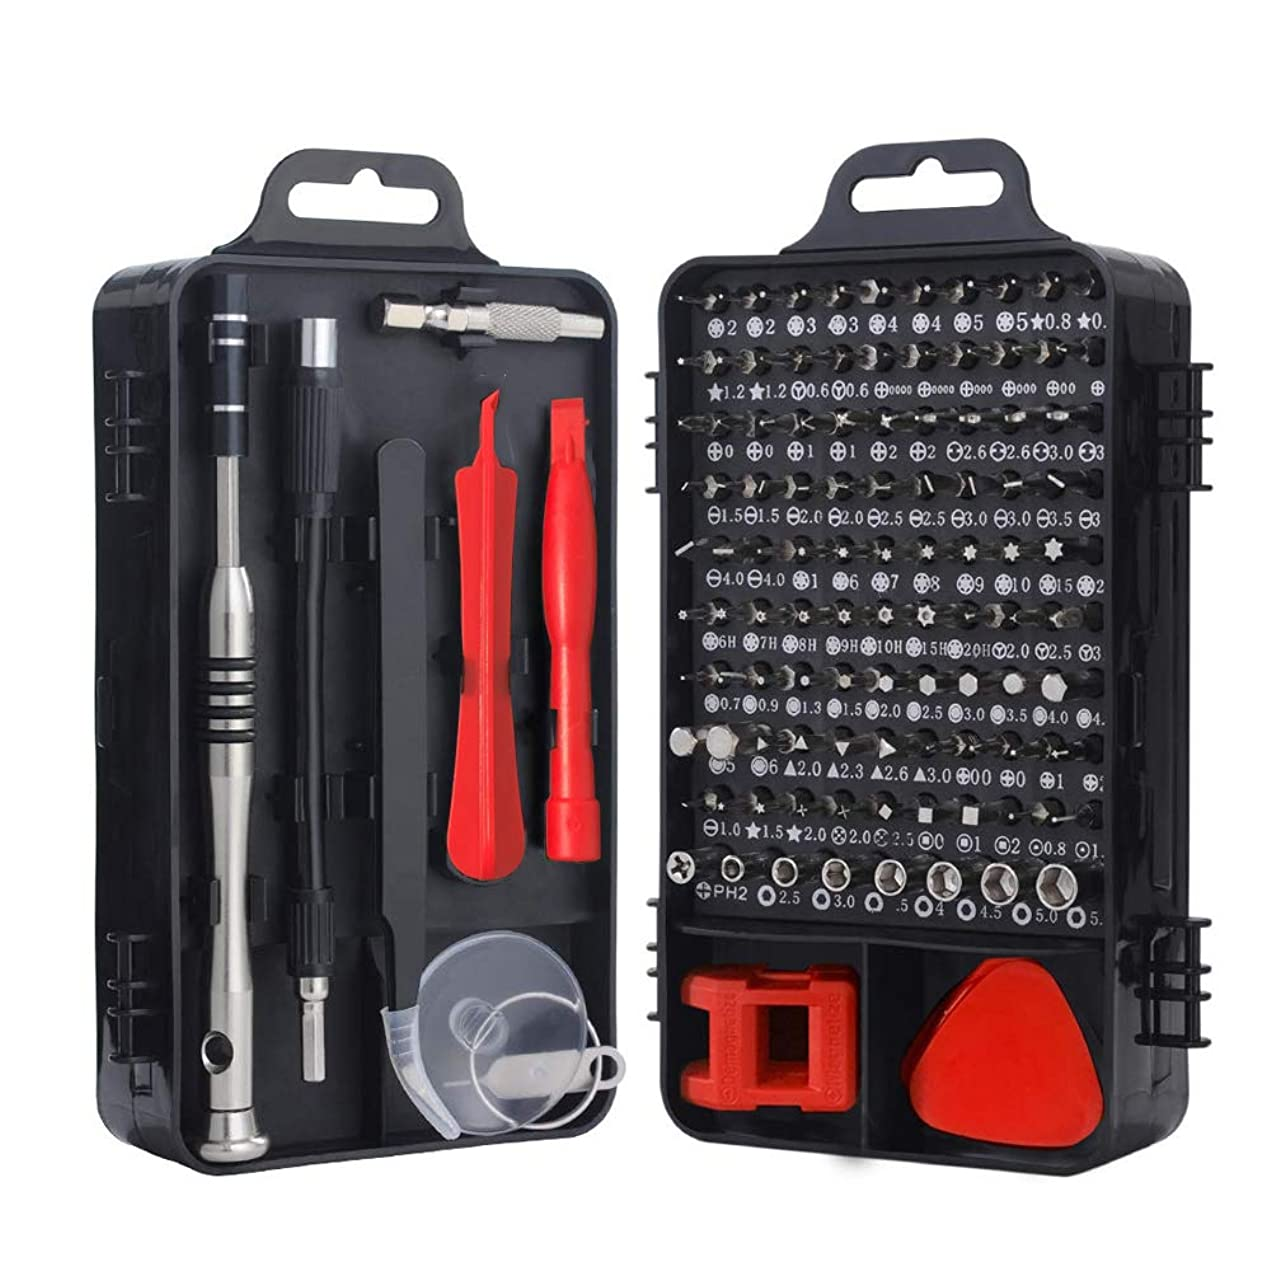 118 in 1 精密ドライバーセット ドライバーキット 磁気修理キット 修理キット iPhone/iPad /ps4/モバイル/ゲーム/タブレット/PC/Mac-bookなどの電子機器用のマルチツールキット